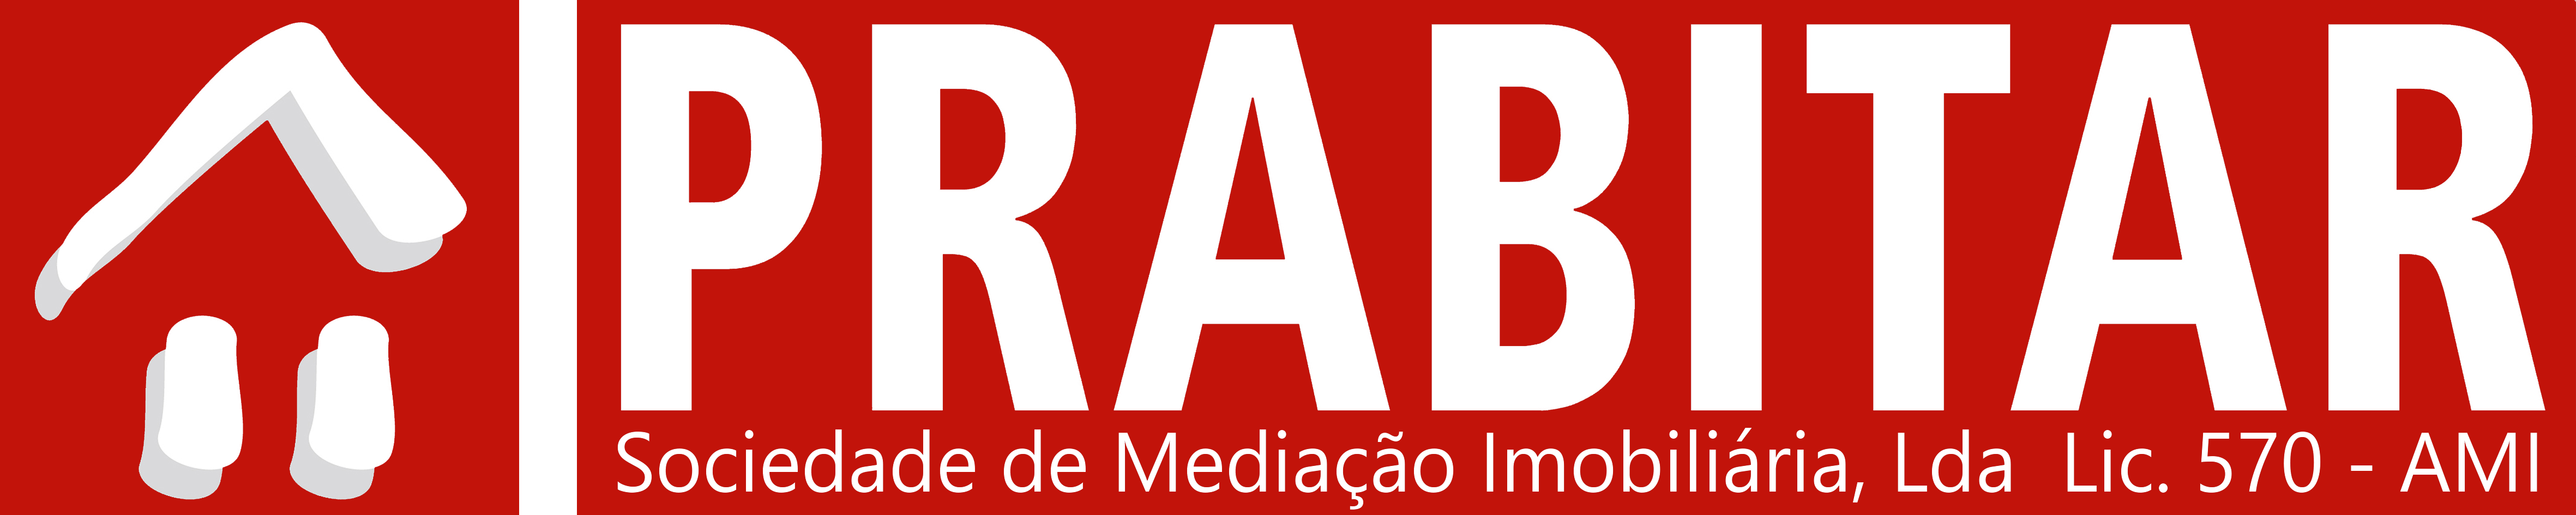 Prabitar - Soc. Med. Imobiliária, Lda.<br /><b />SEDE